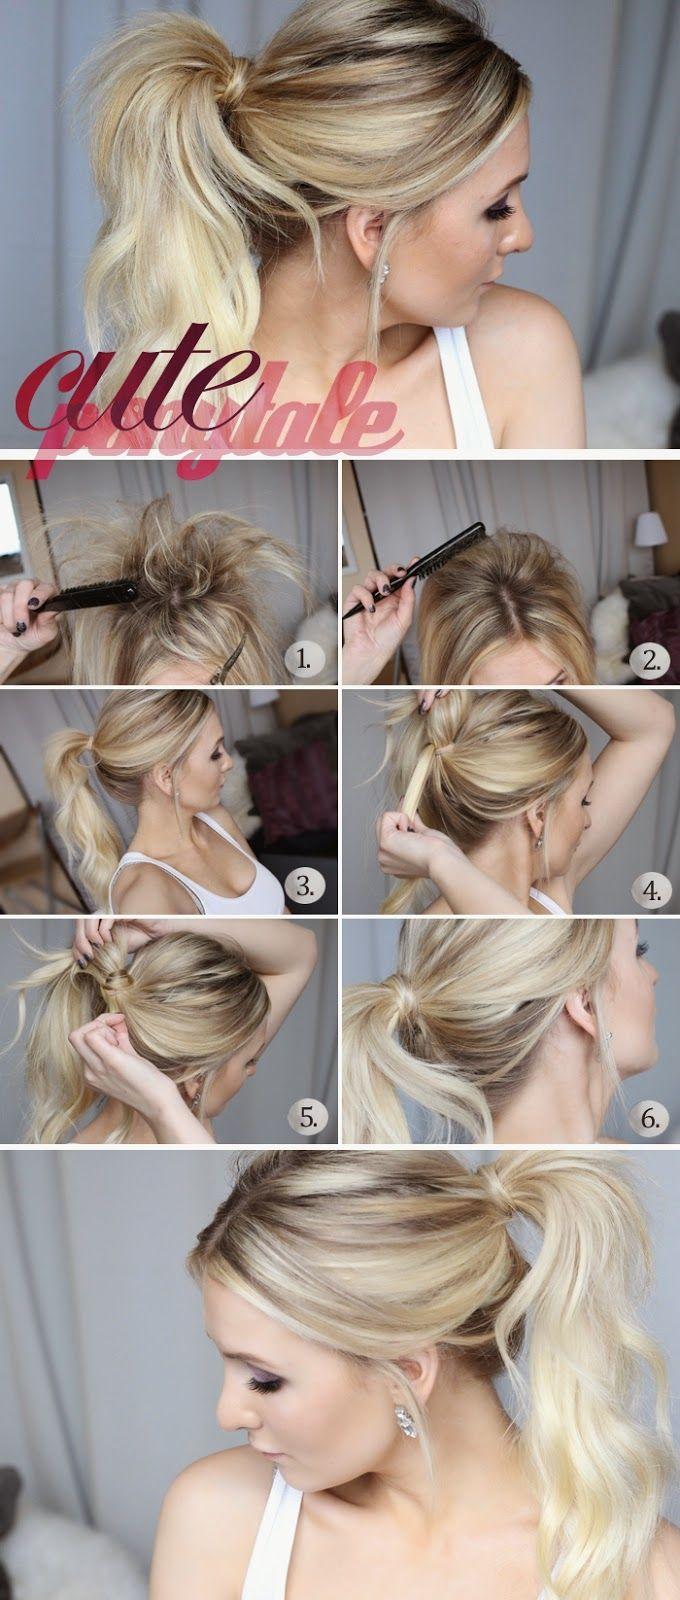 Diy cute ponytail hair styles pinterest ponytail inspiring